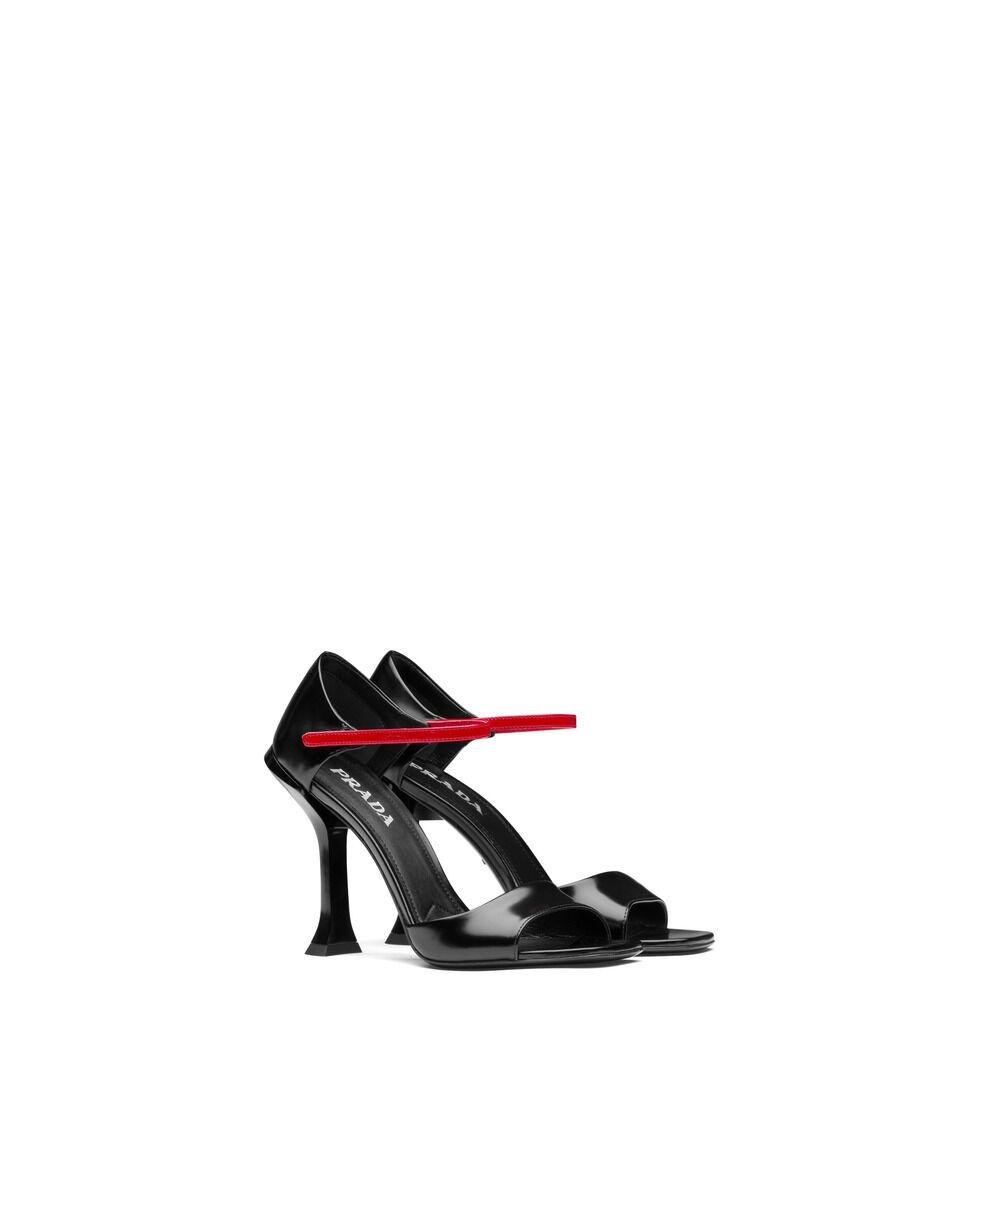 Sandali in pelle spazzolata bicolore - Prada